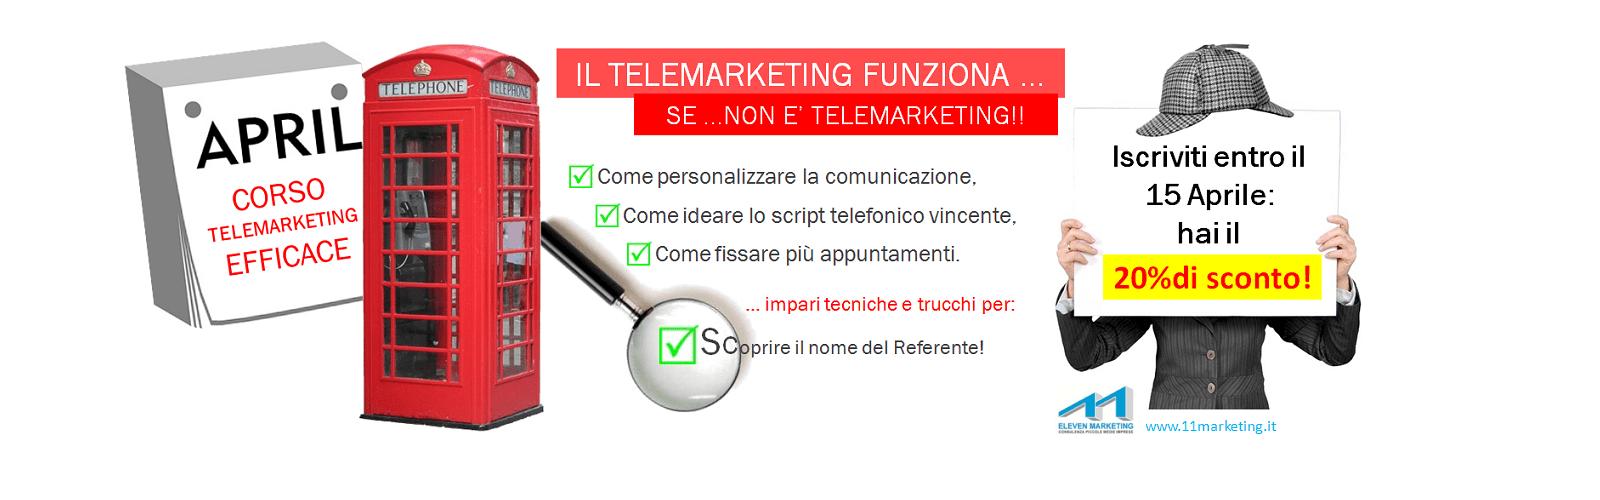 corso-telemarketing-efficace-roma-ok-1600x500